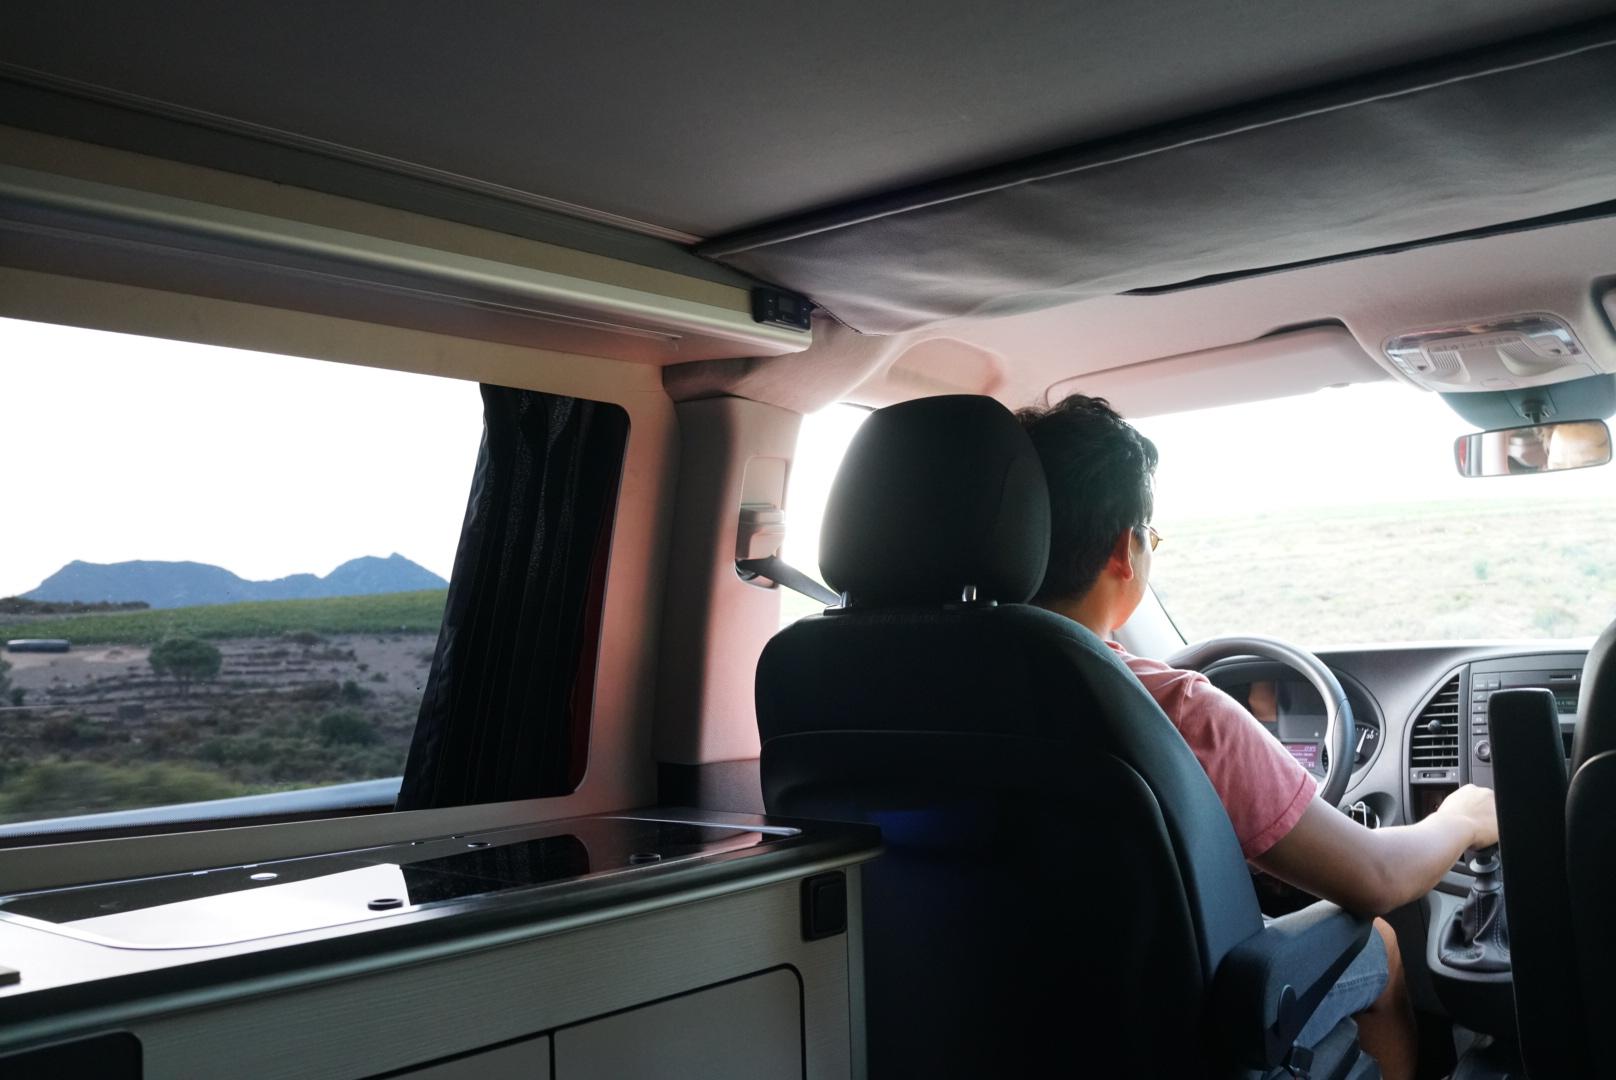 Day 4: Fin. Onwards to San Sebastian -